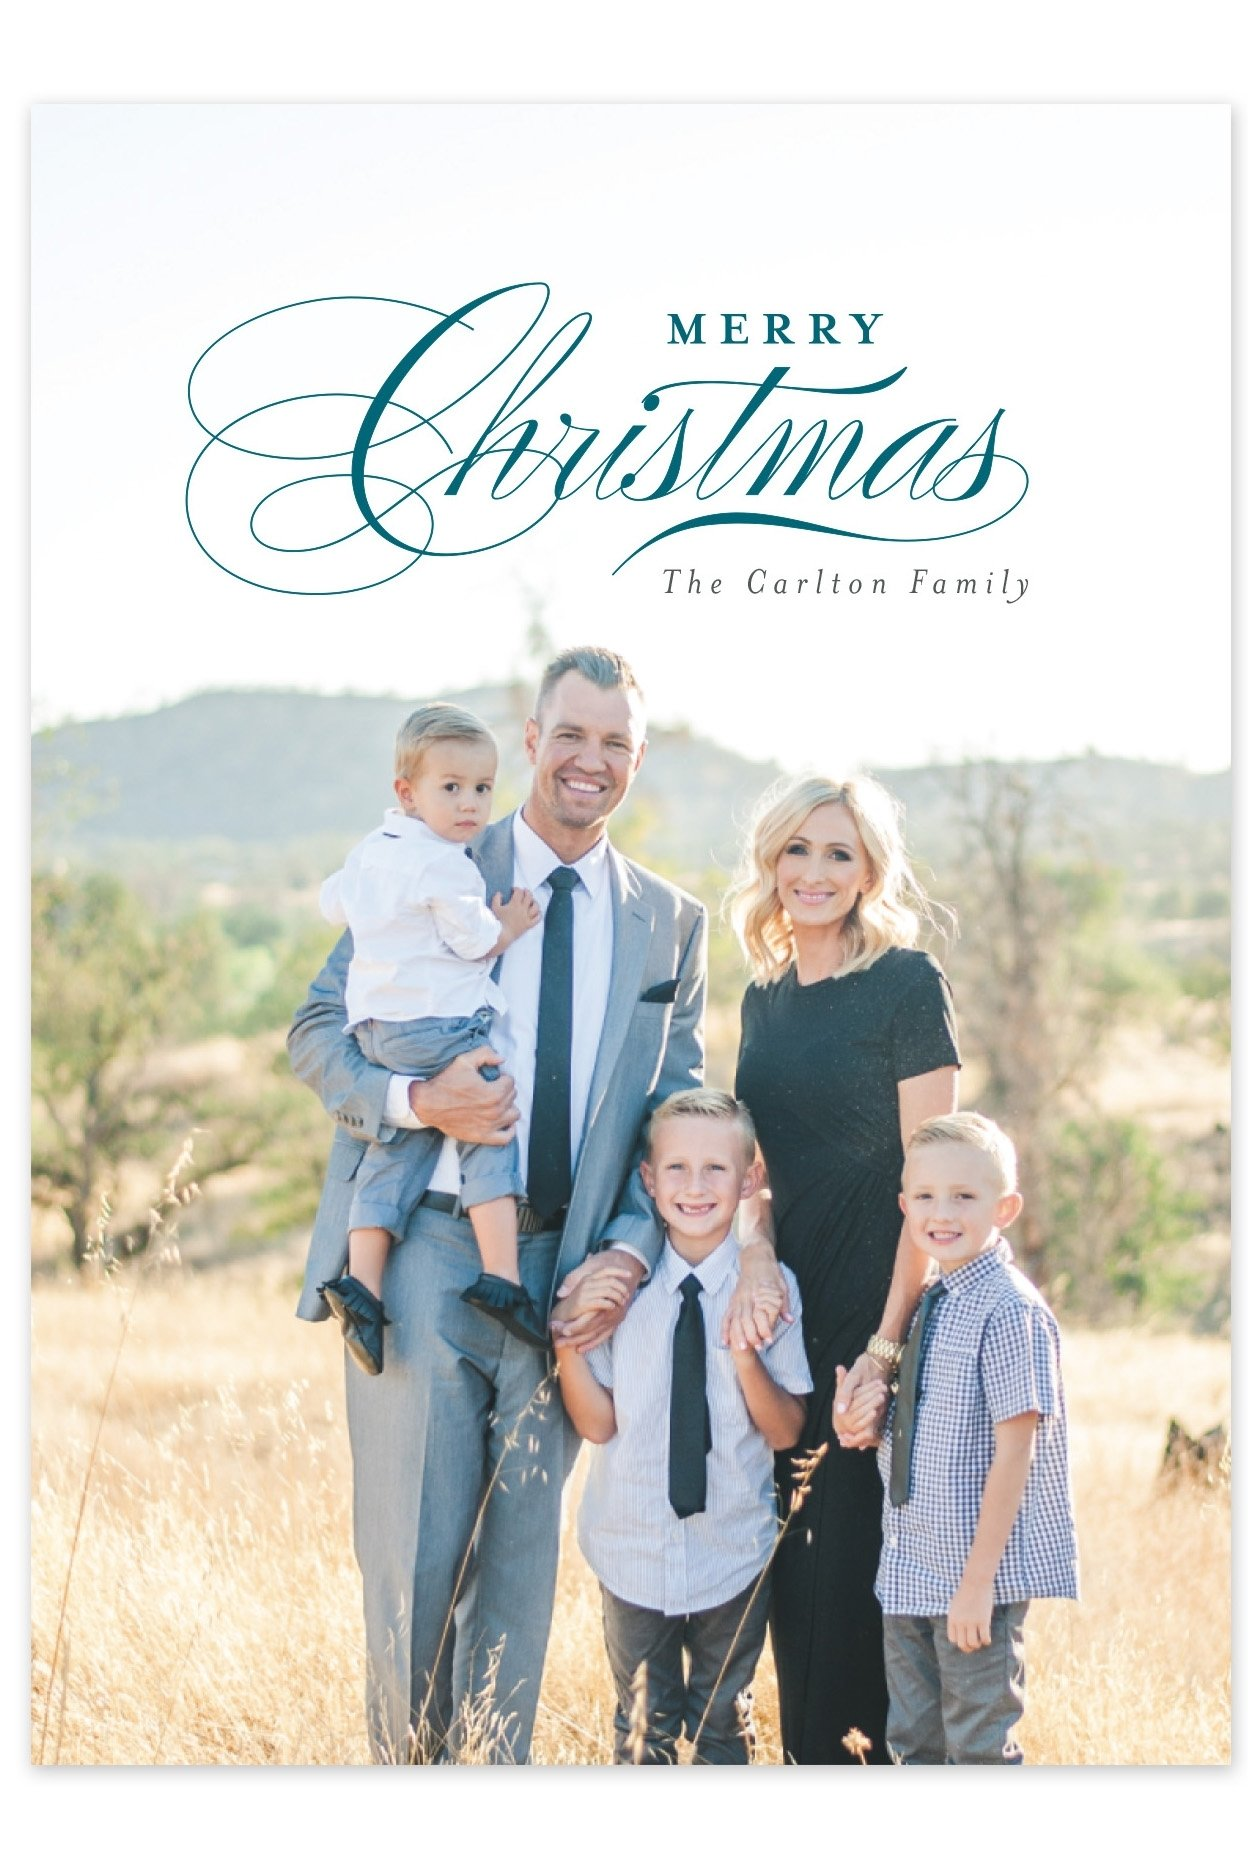 10 Stylish Christmas Card Photo Poses Ideas funny christmas card photo ideas merry christmas and happy new 2 2020